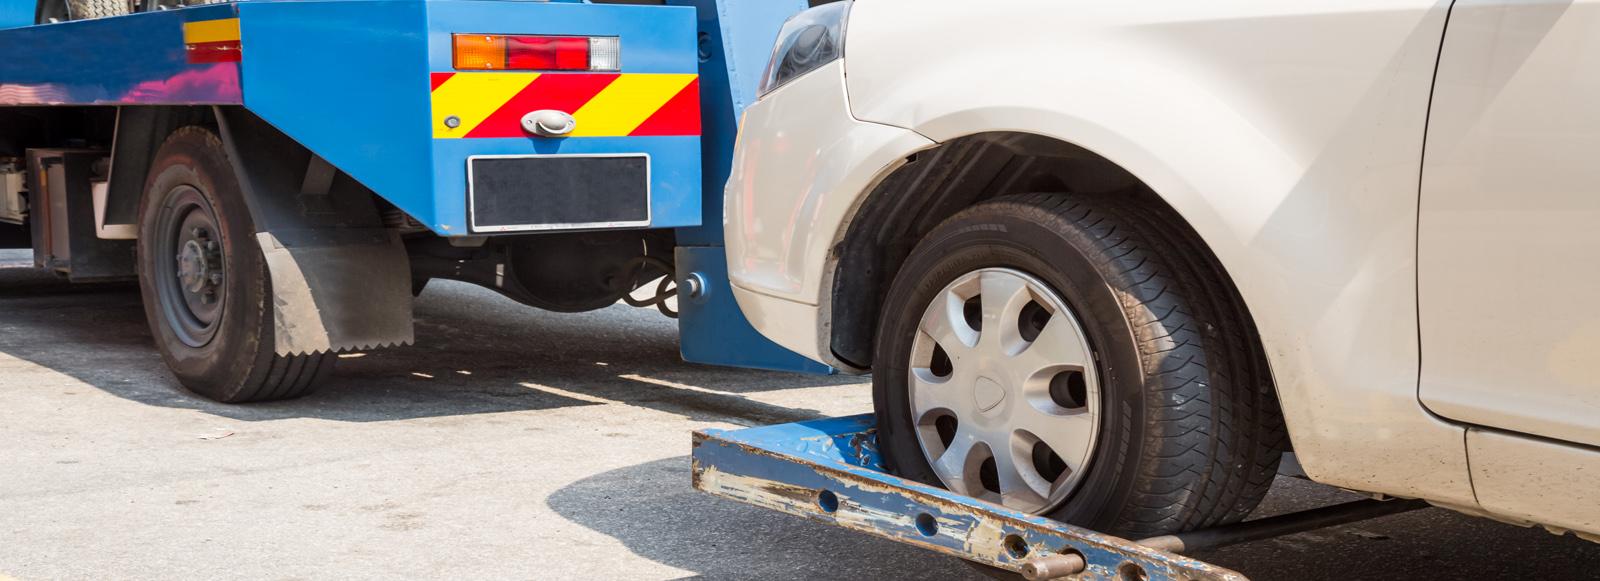 Forsyth Auto Service - expert auto repair - Kernersville, NC